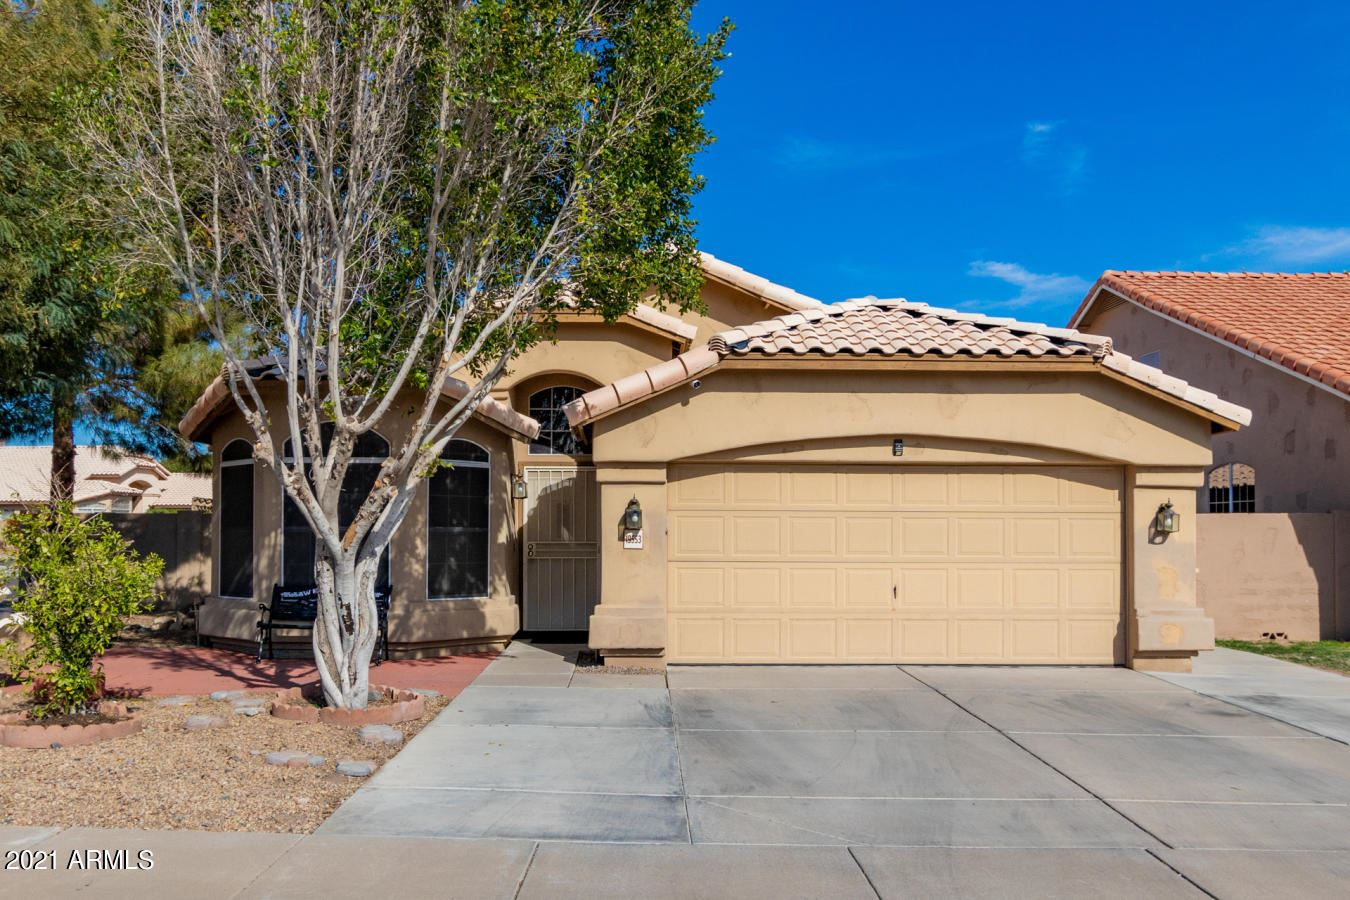 19553 N 53RD Avenue, Glendale, AZ 85308 - MLS#: 6198262